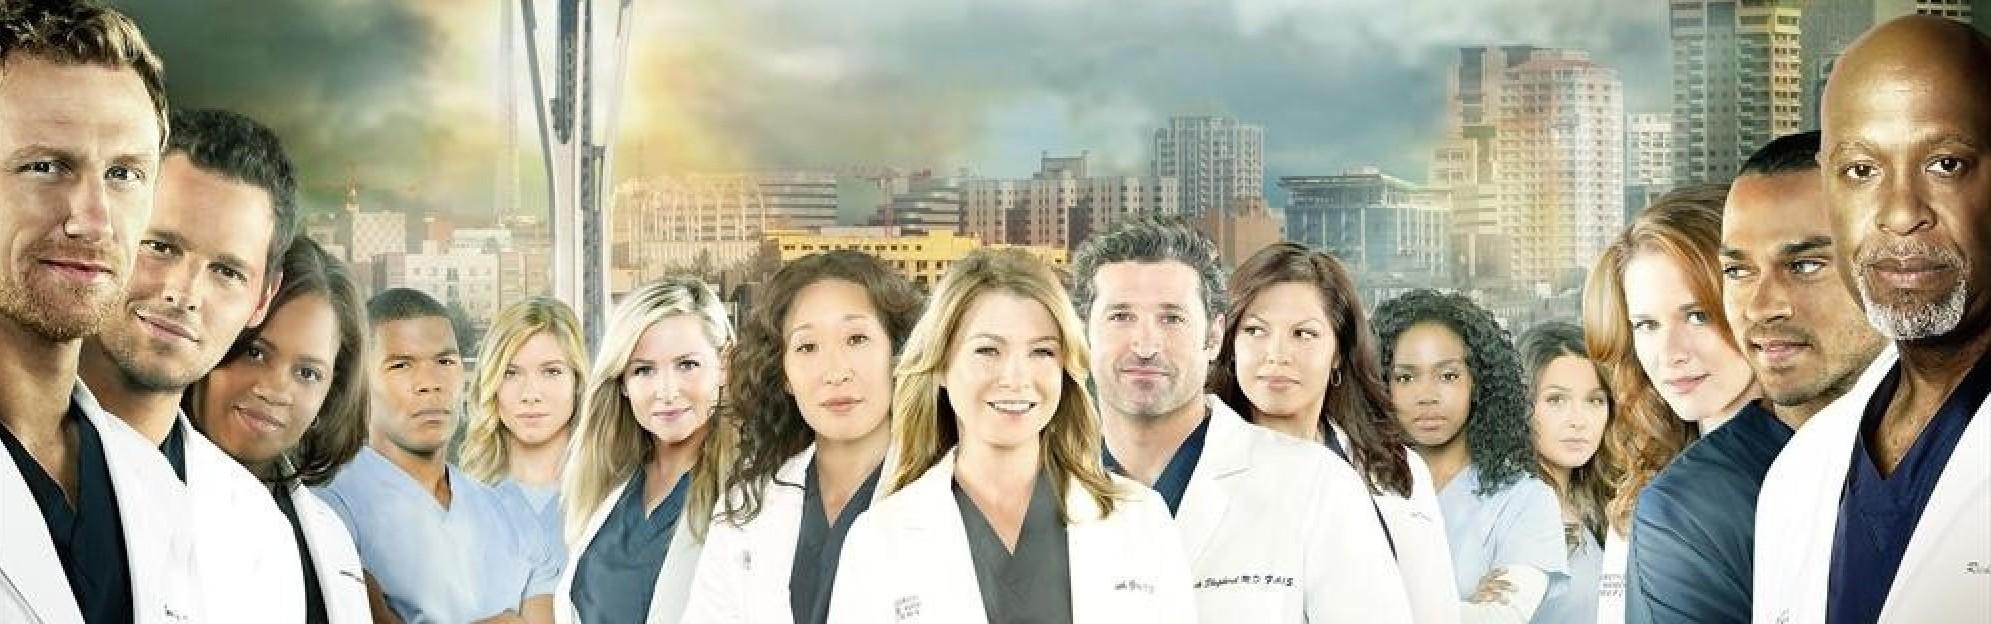 Bild - Greys Anatomy Season 10 Banner.jpg | Grey\'s Anatomy Wiki ...